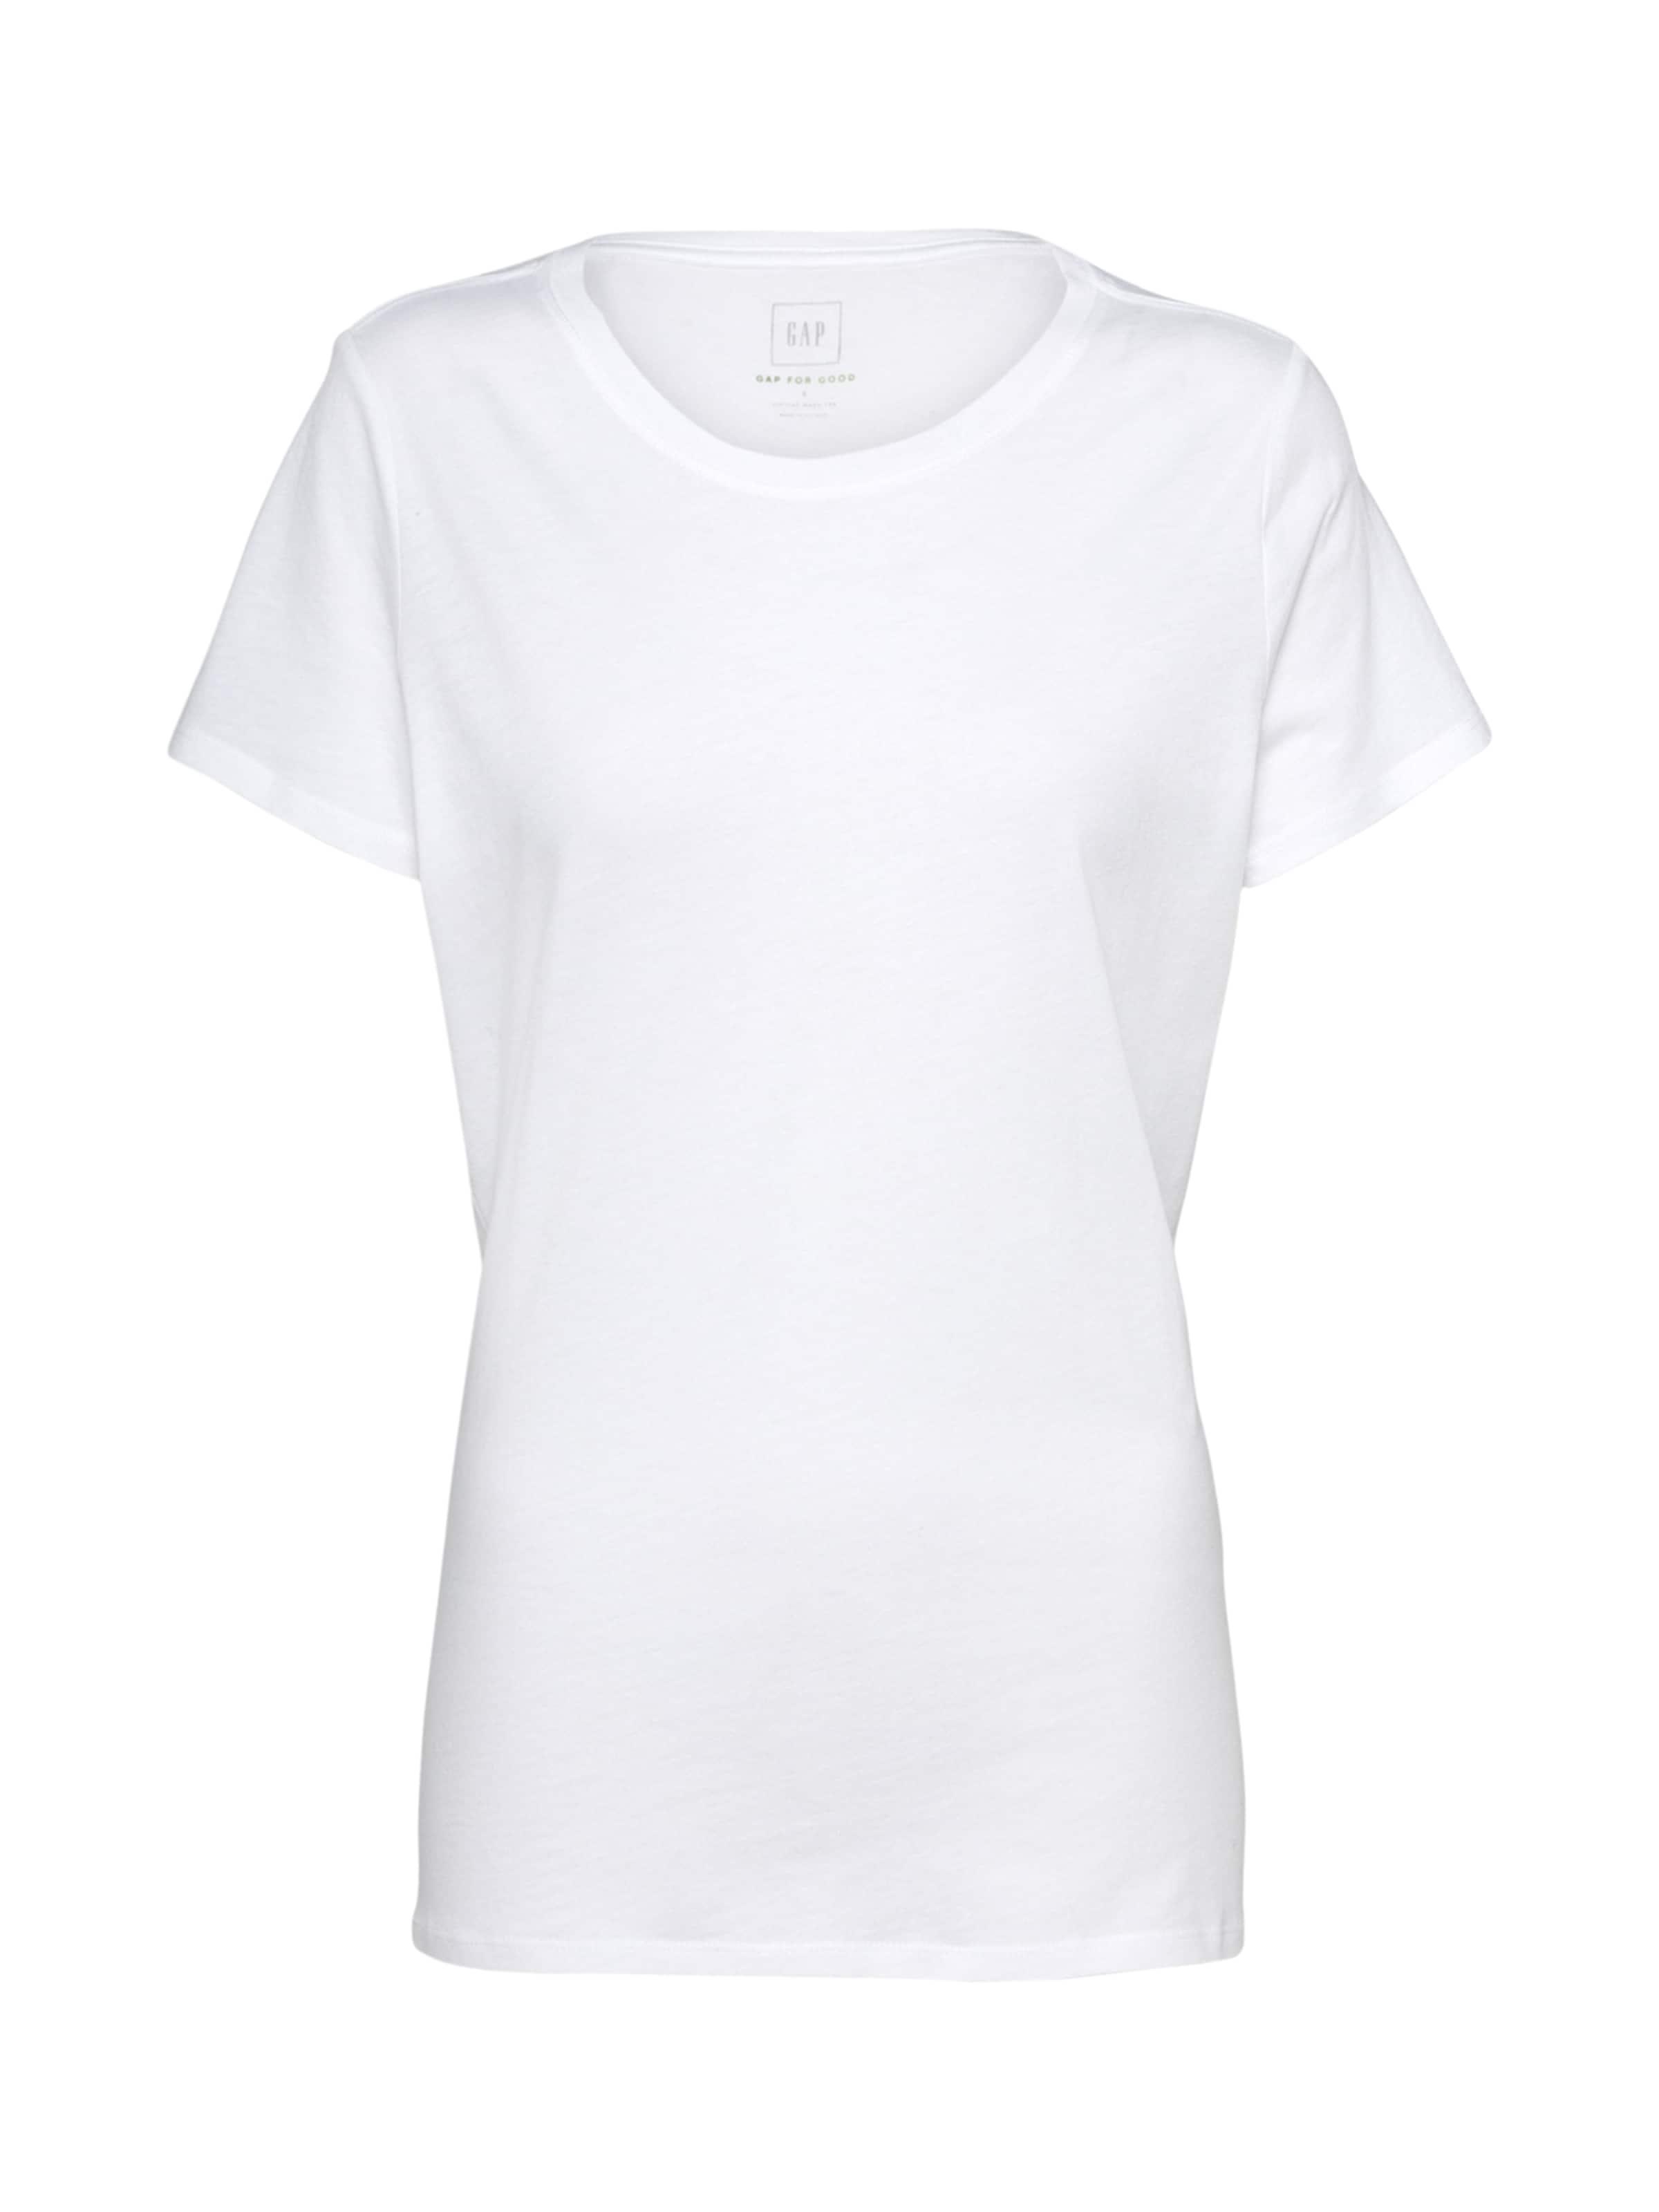 Gap shirt En Marine T Bleu 'vint' QWdroeECxB